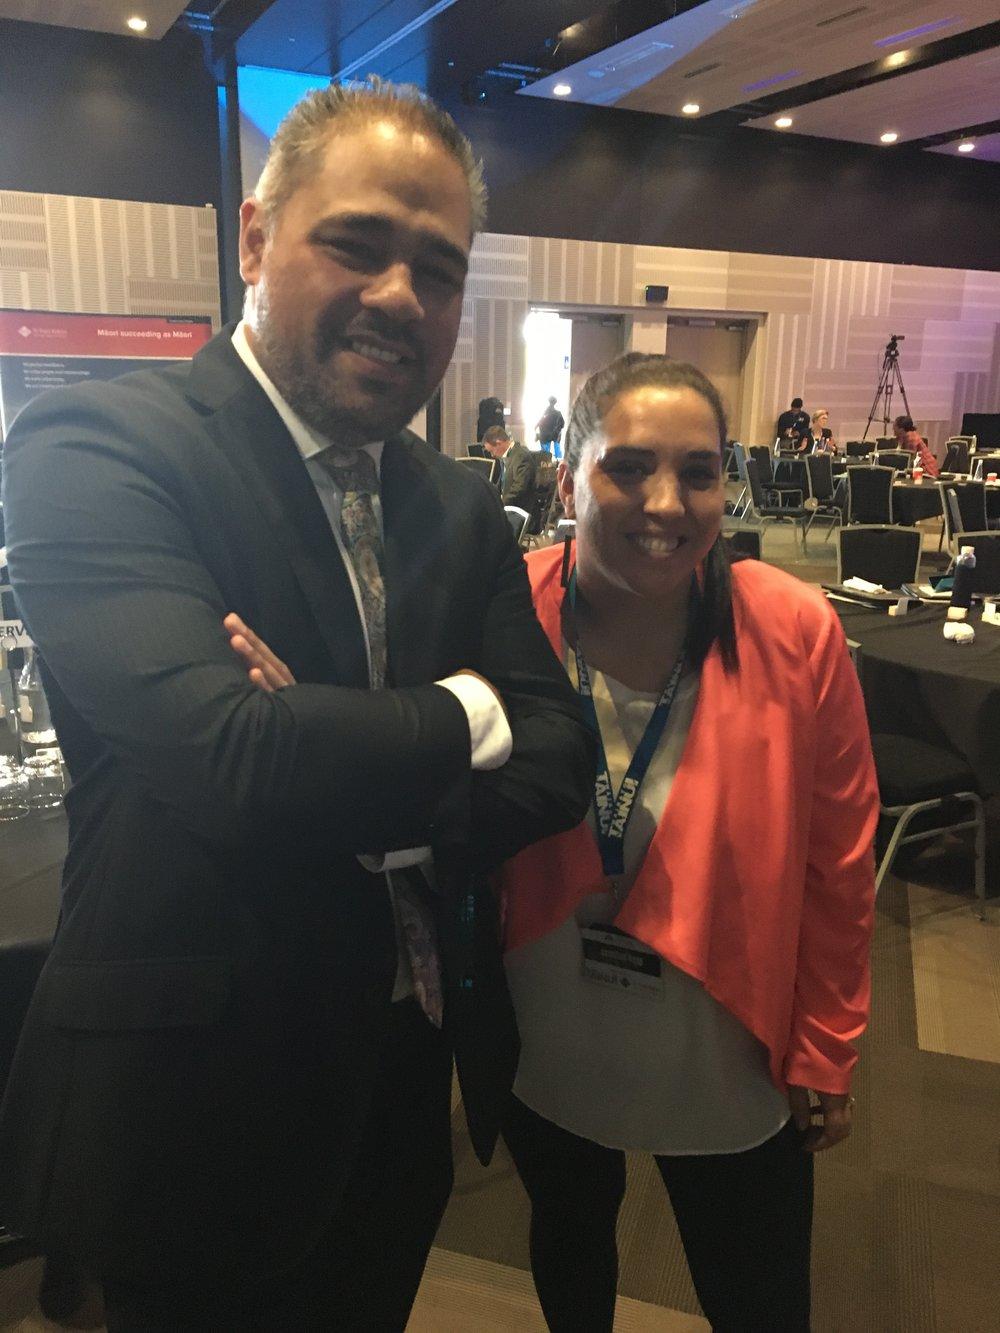 Jasmine Briggs with the Minister for Whānau Ora Hon Peeni Henare